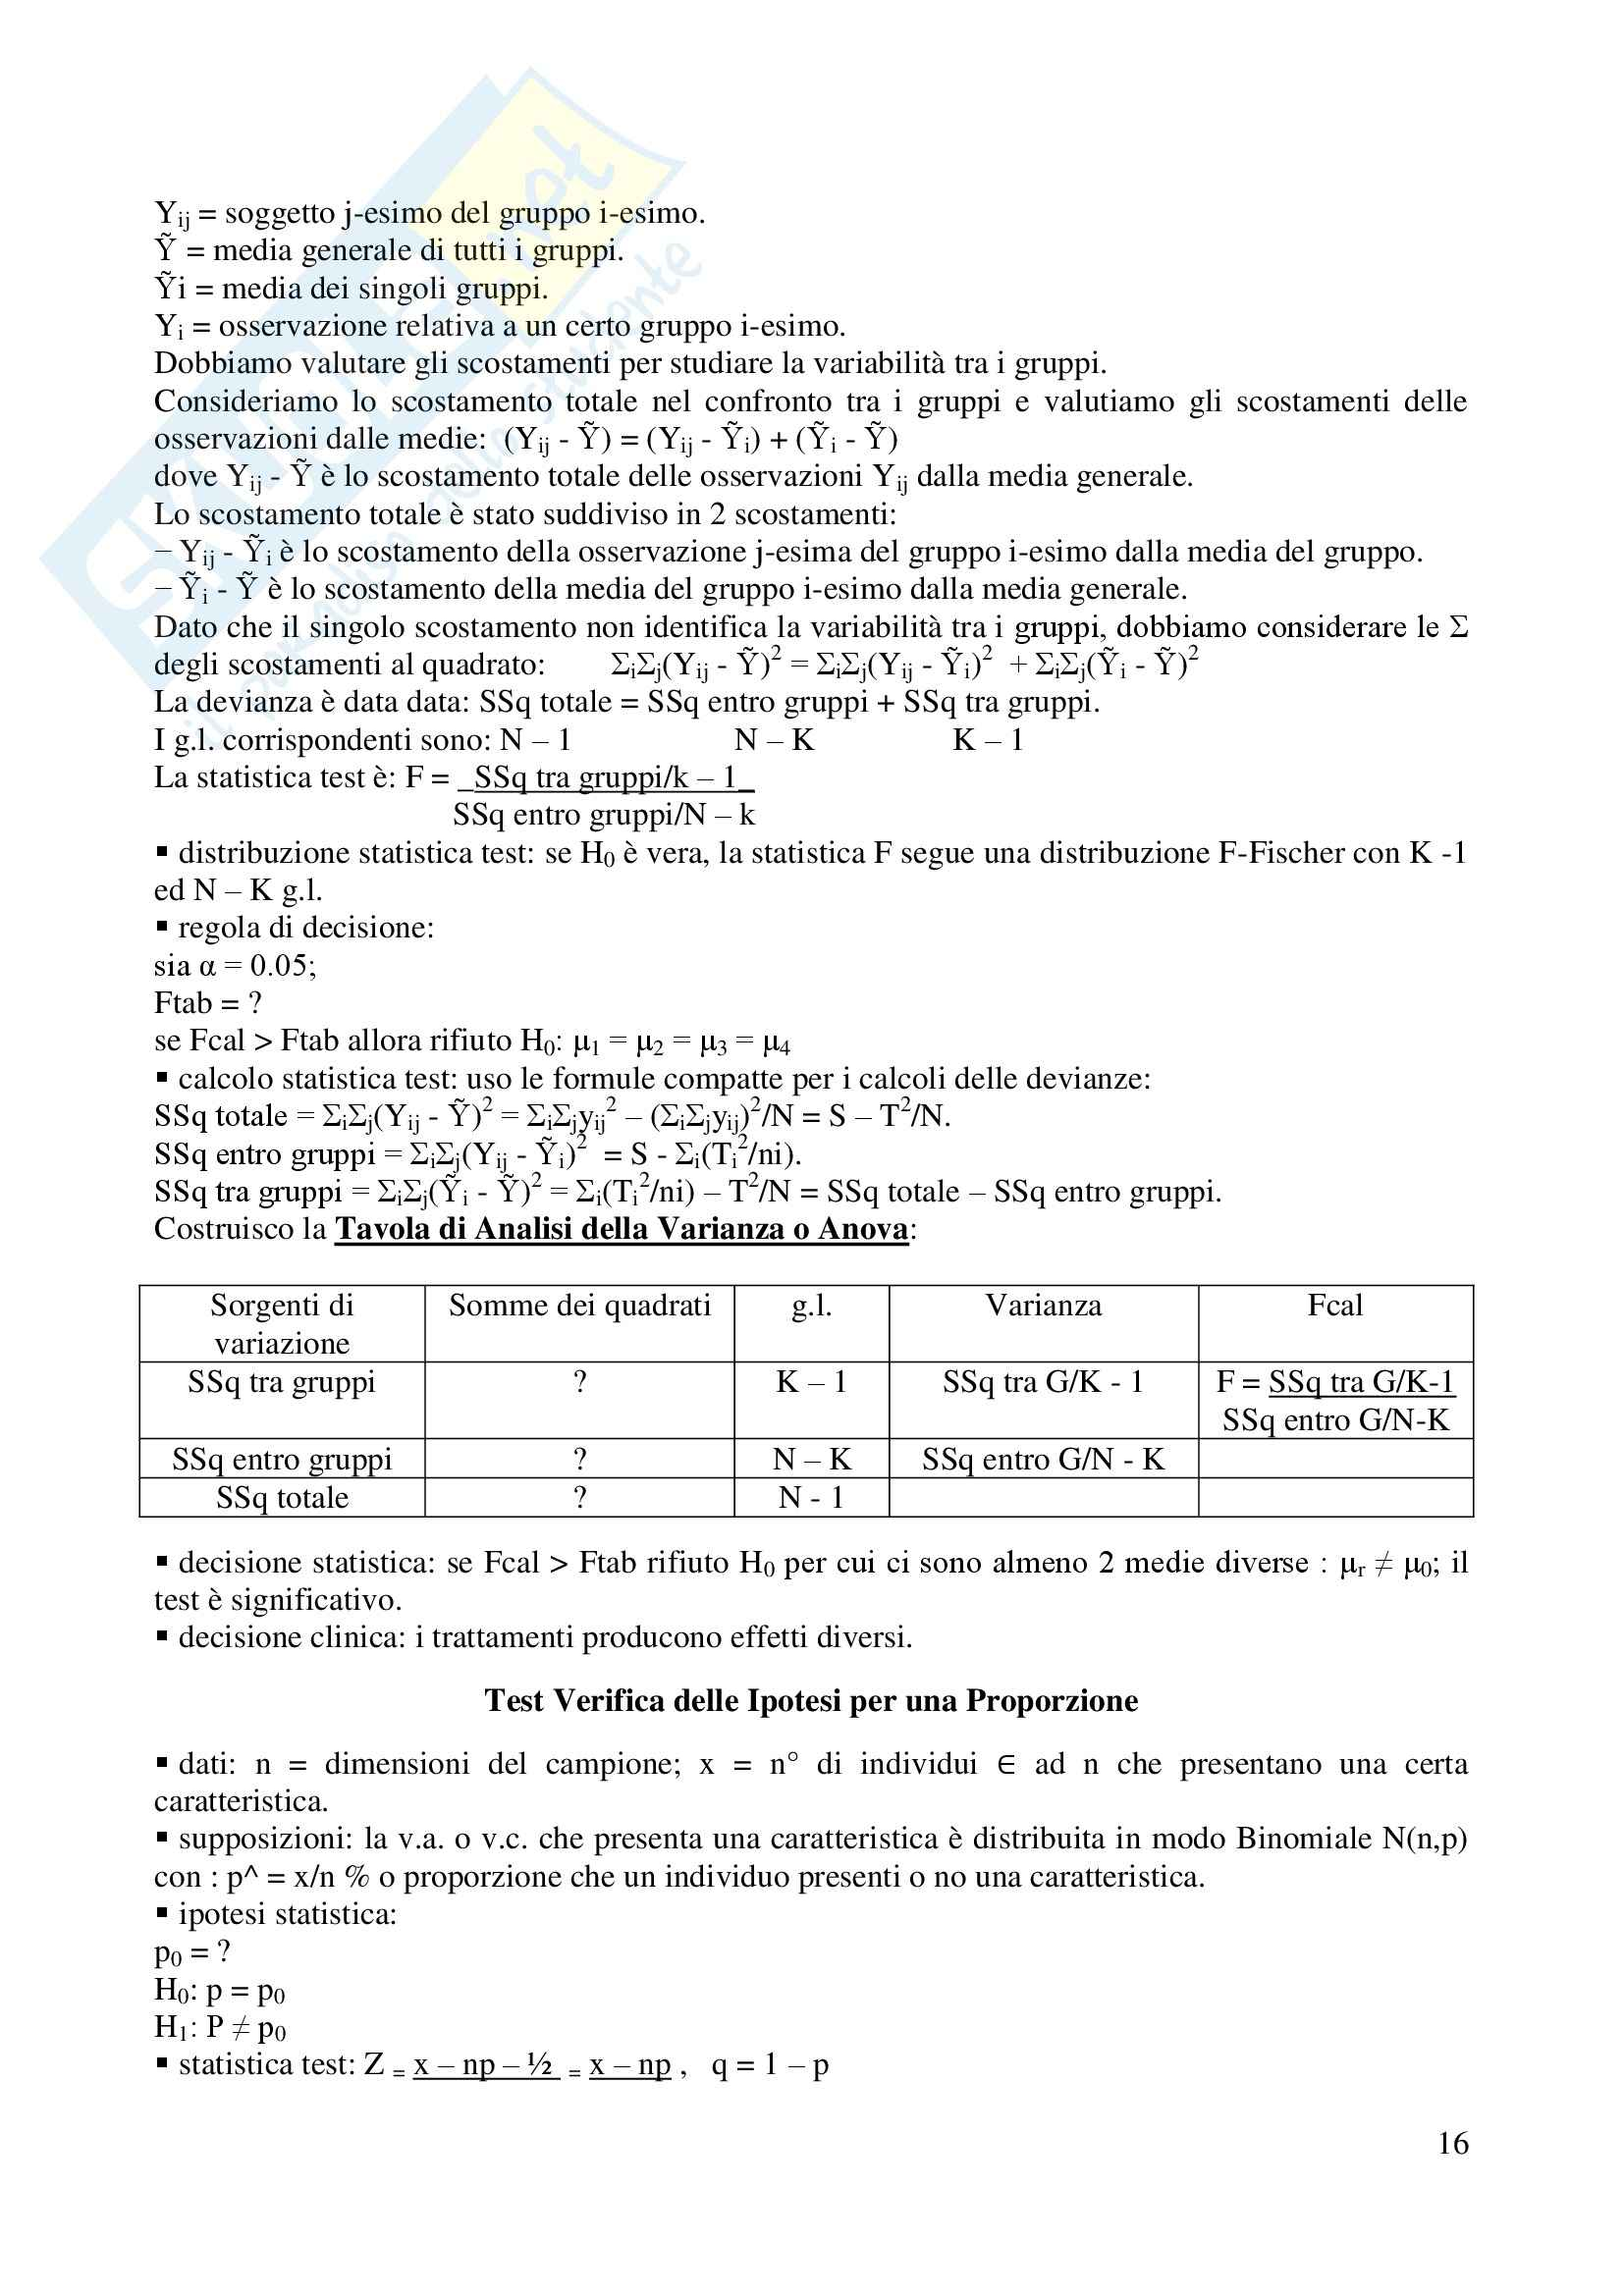 Statistica - Appunti Pag. 16